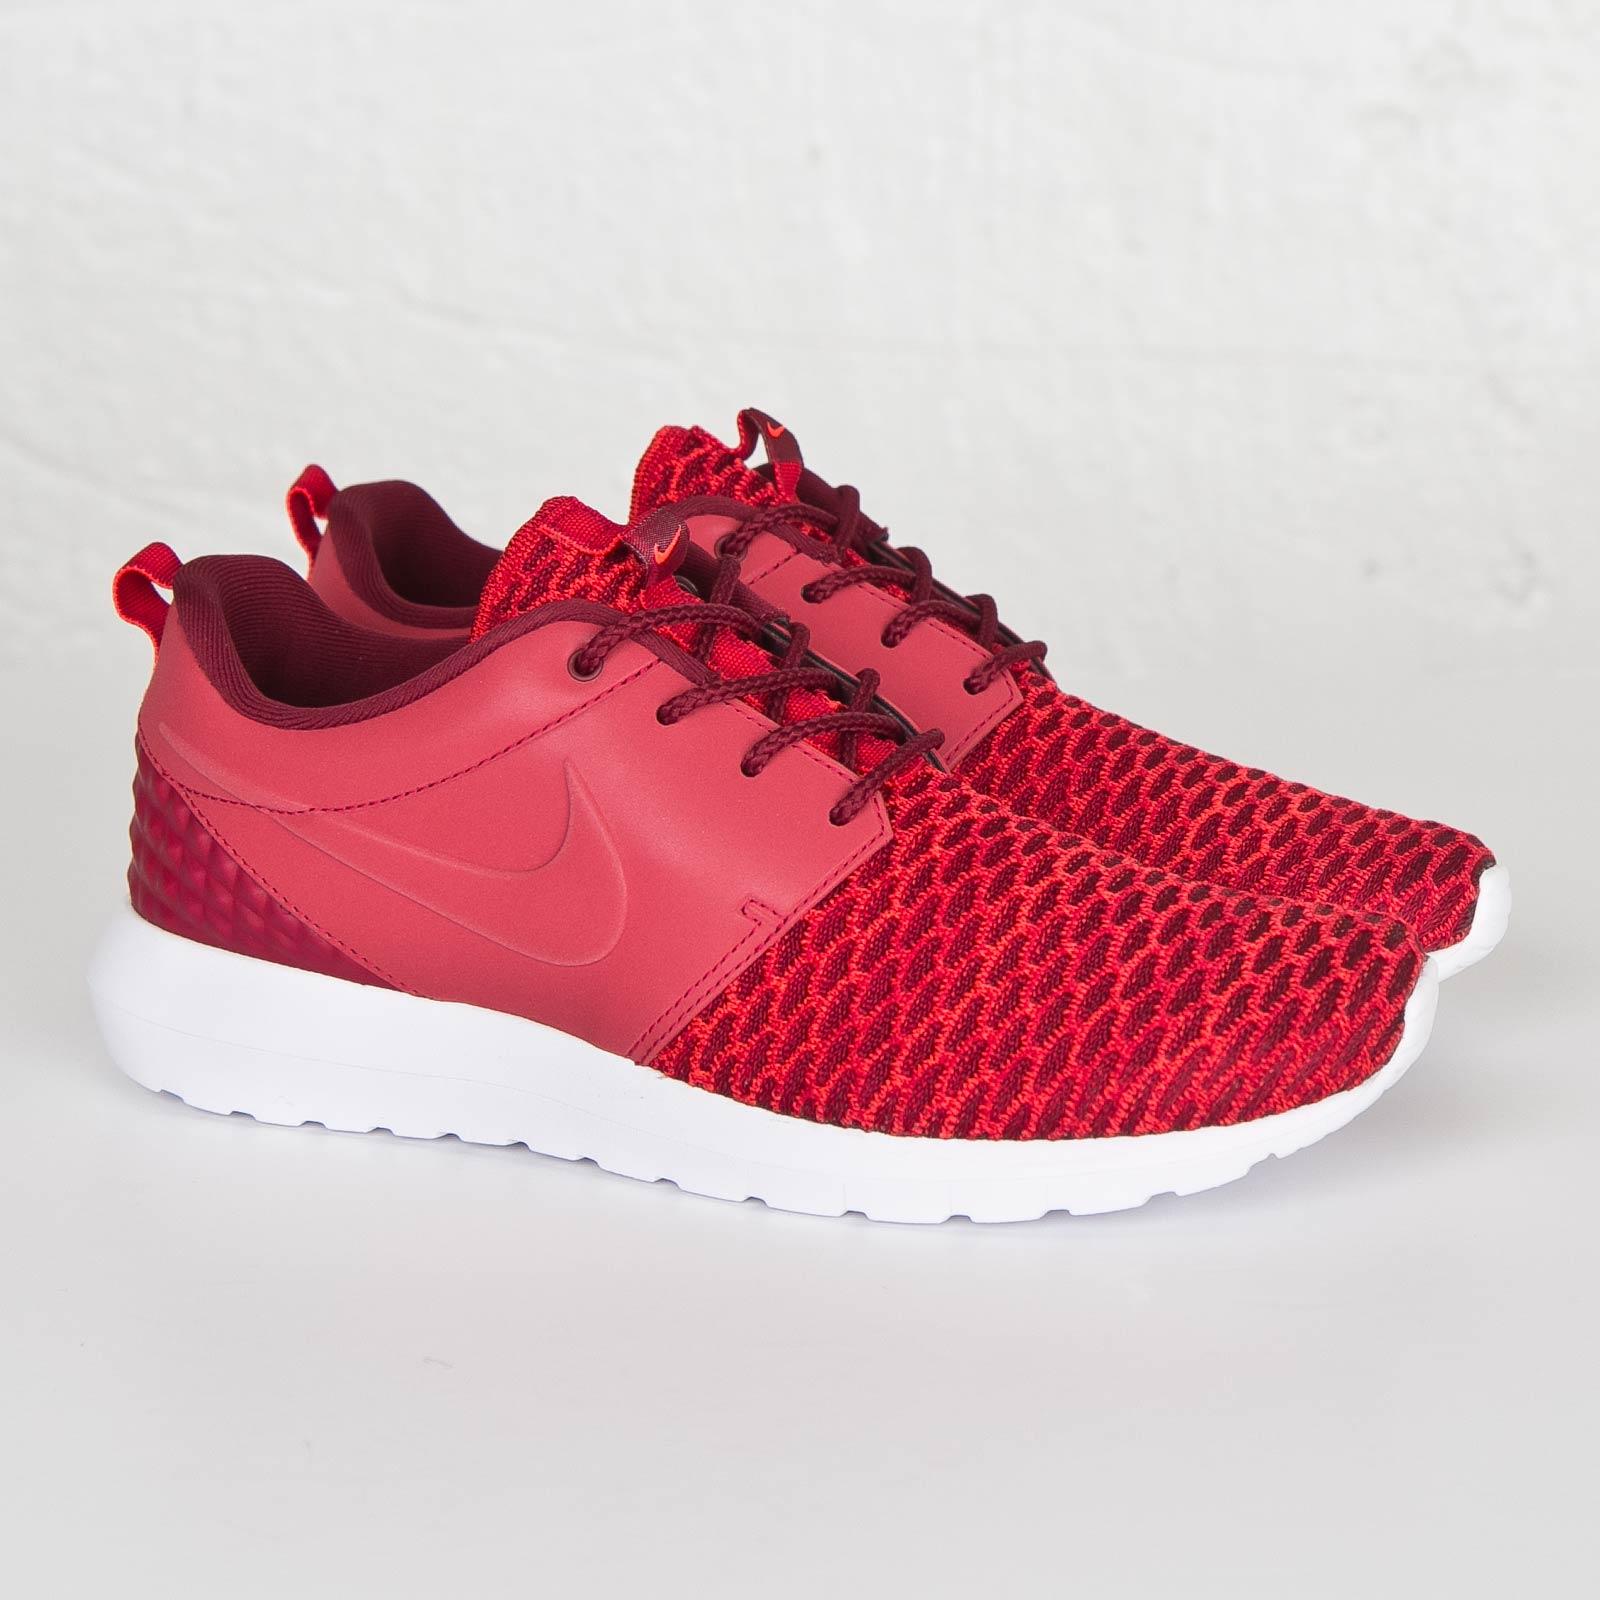 Nike Roshe One Flyknit Premium 746825 600 Sneakersnstuff